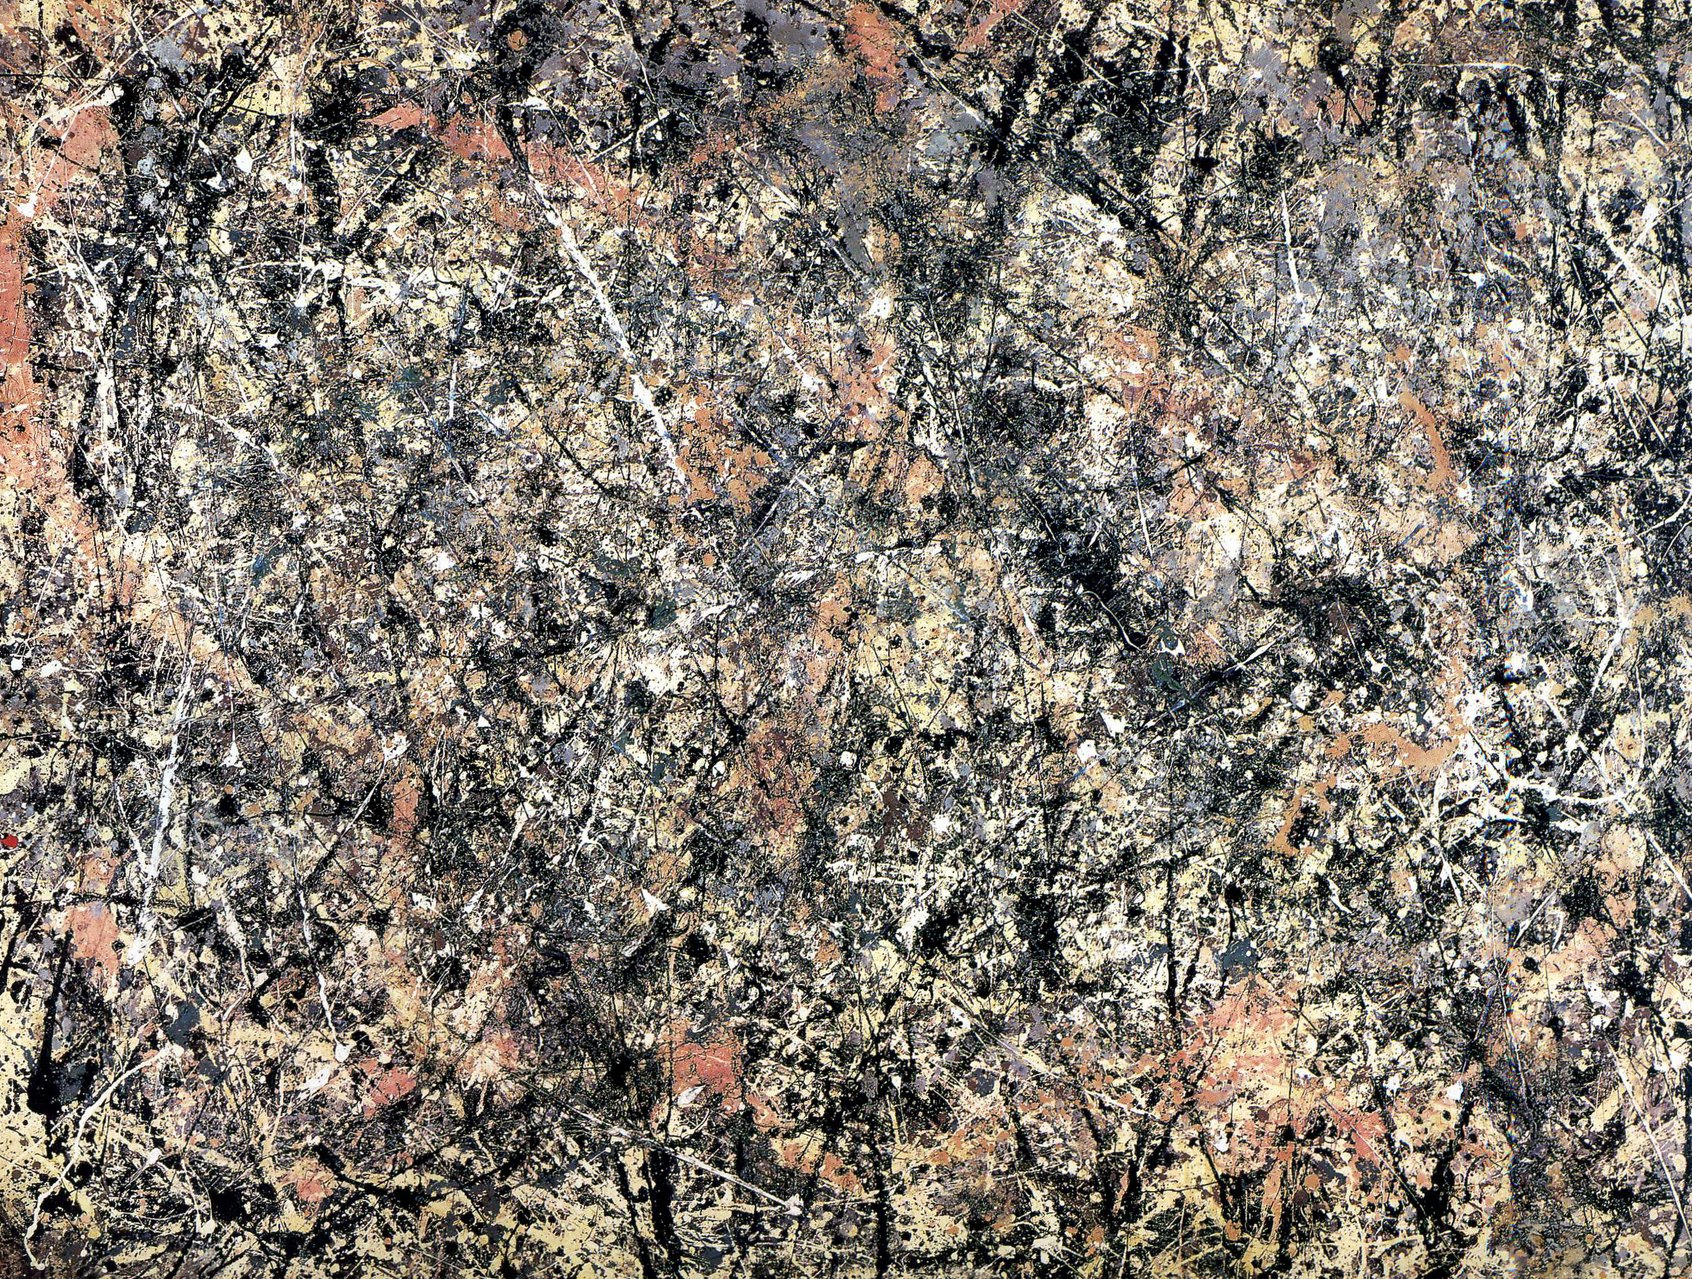 Jackson Pollock,  Lavender Mist